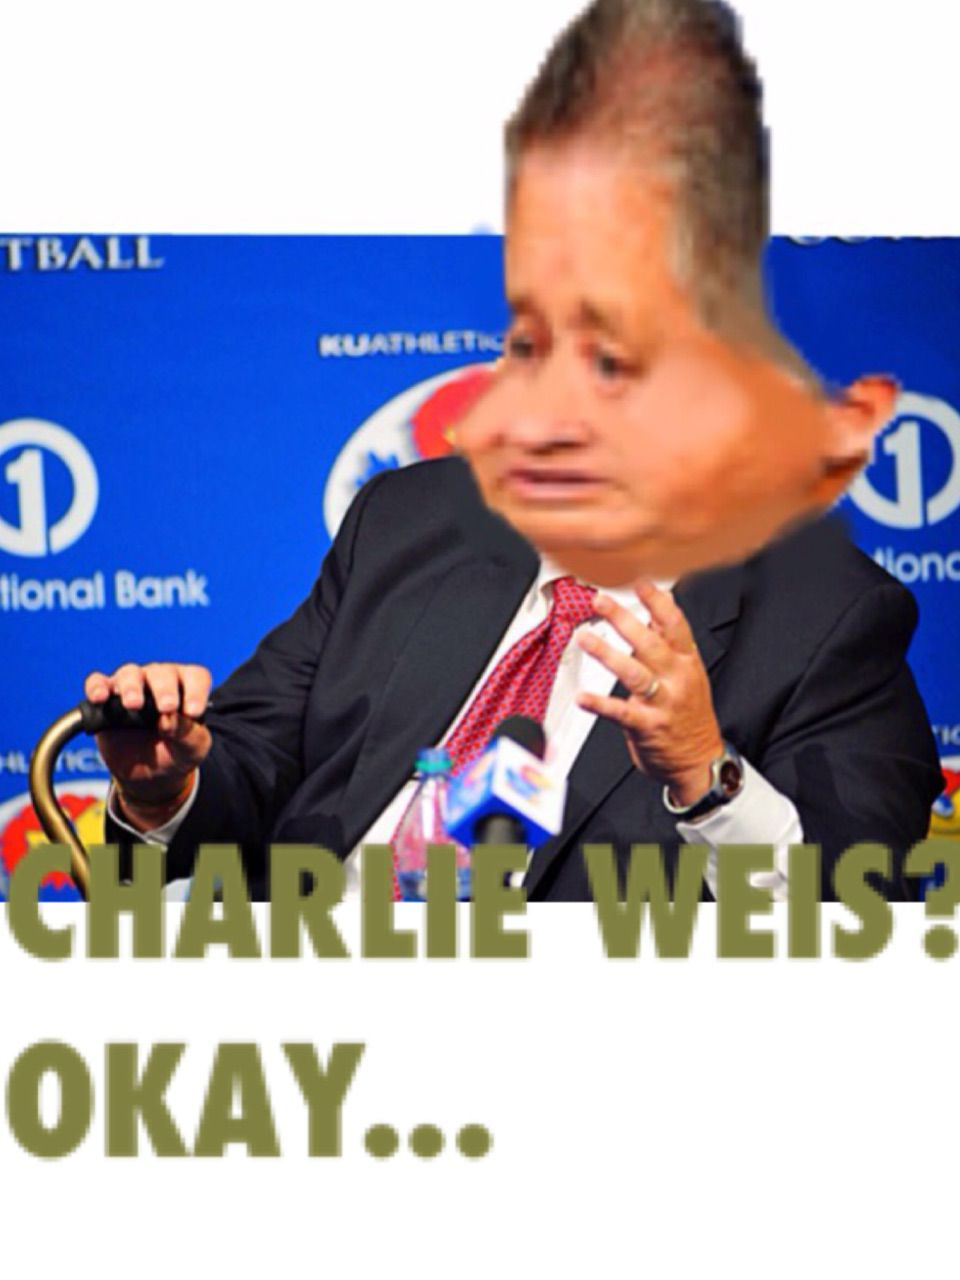 Charlie Weis OC